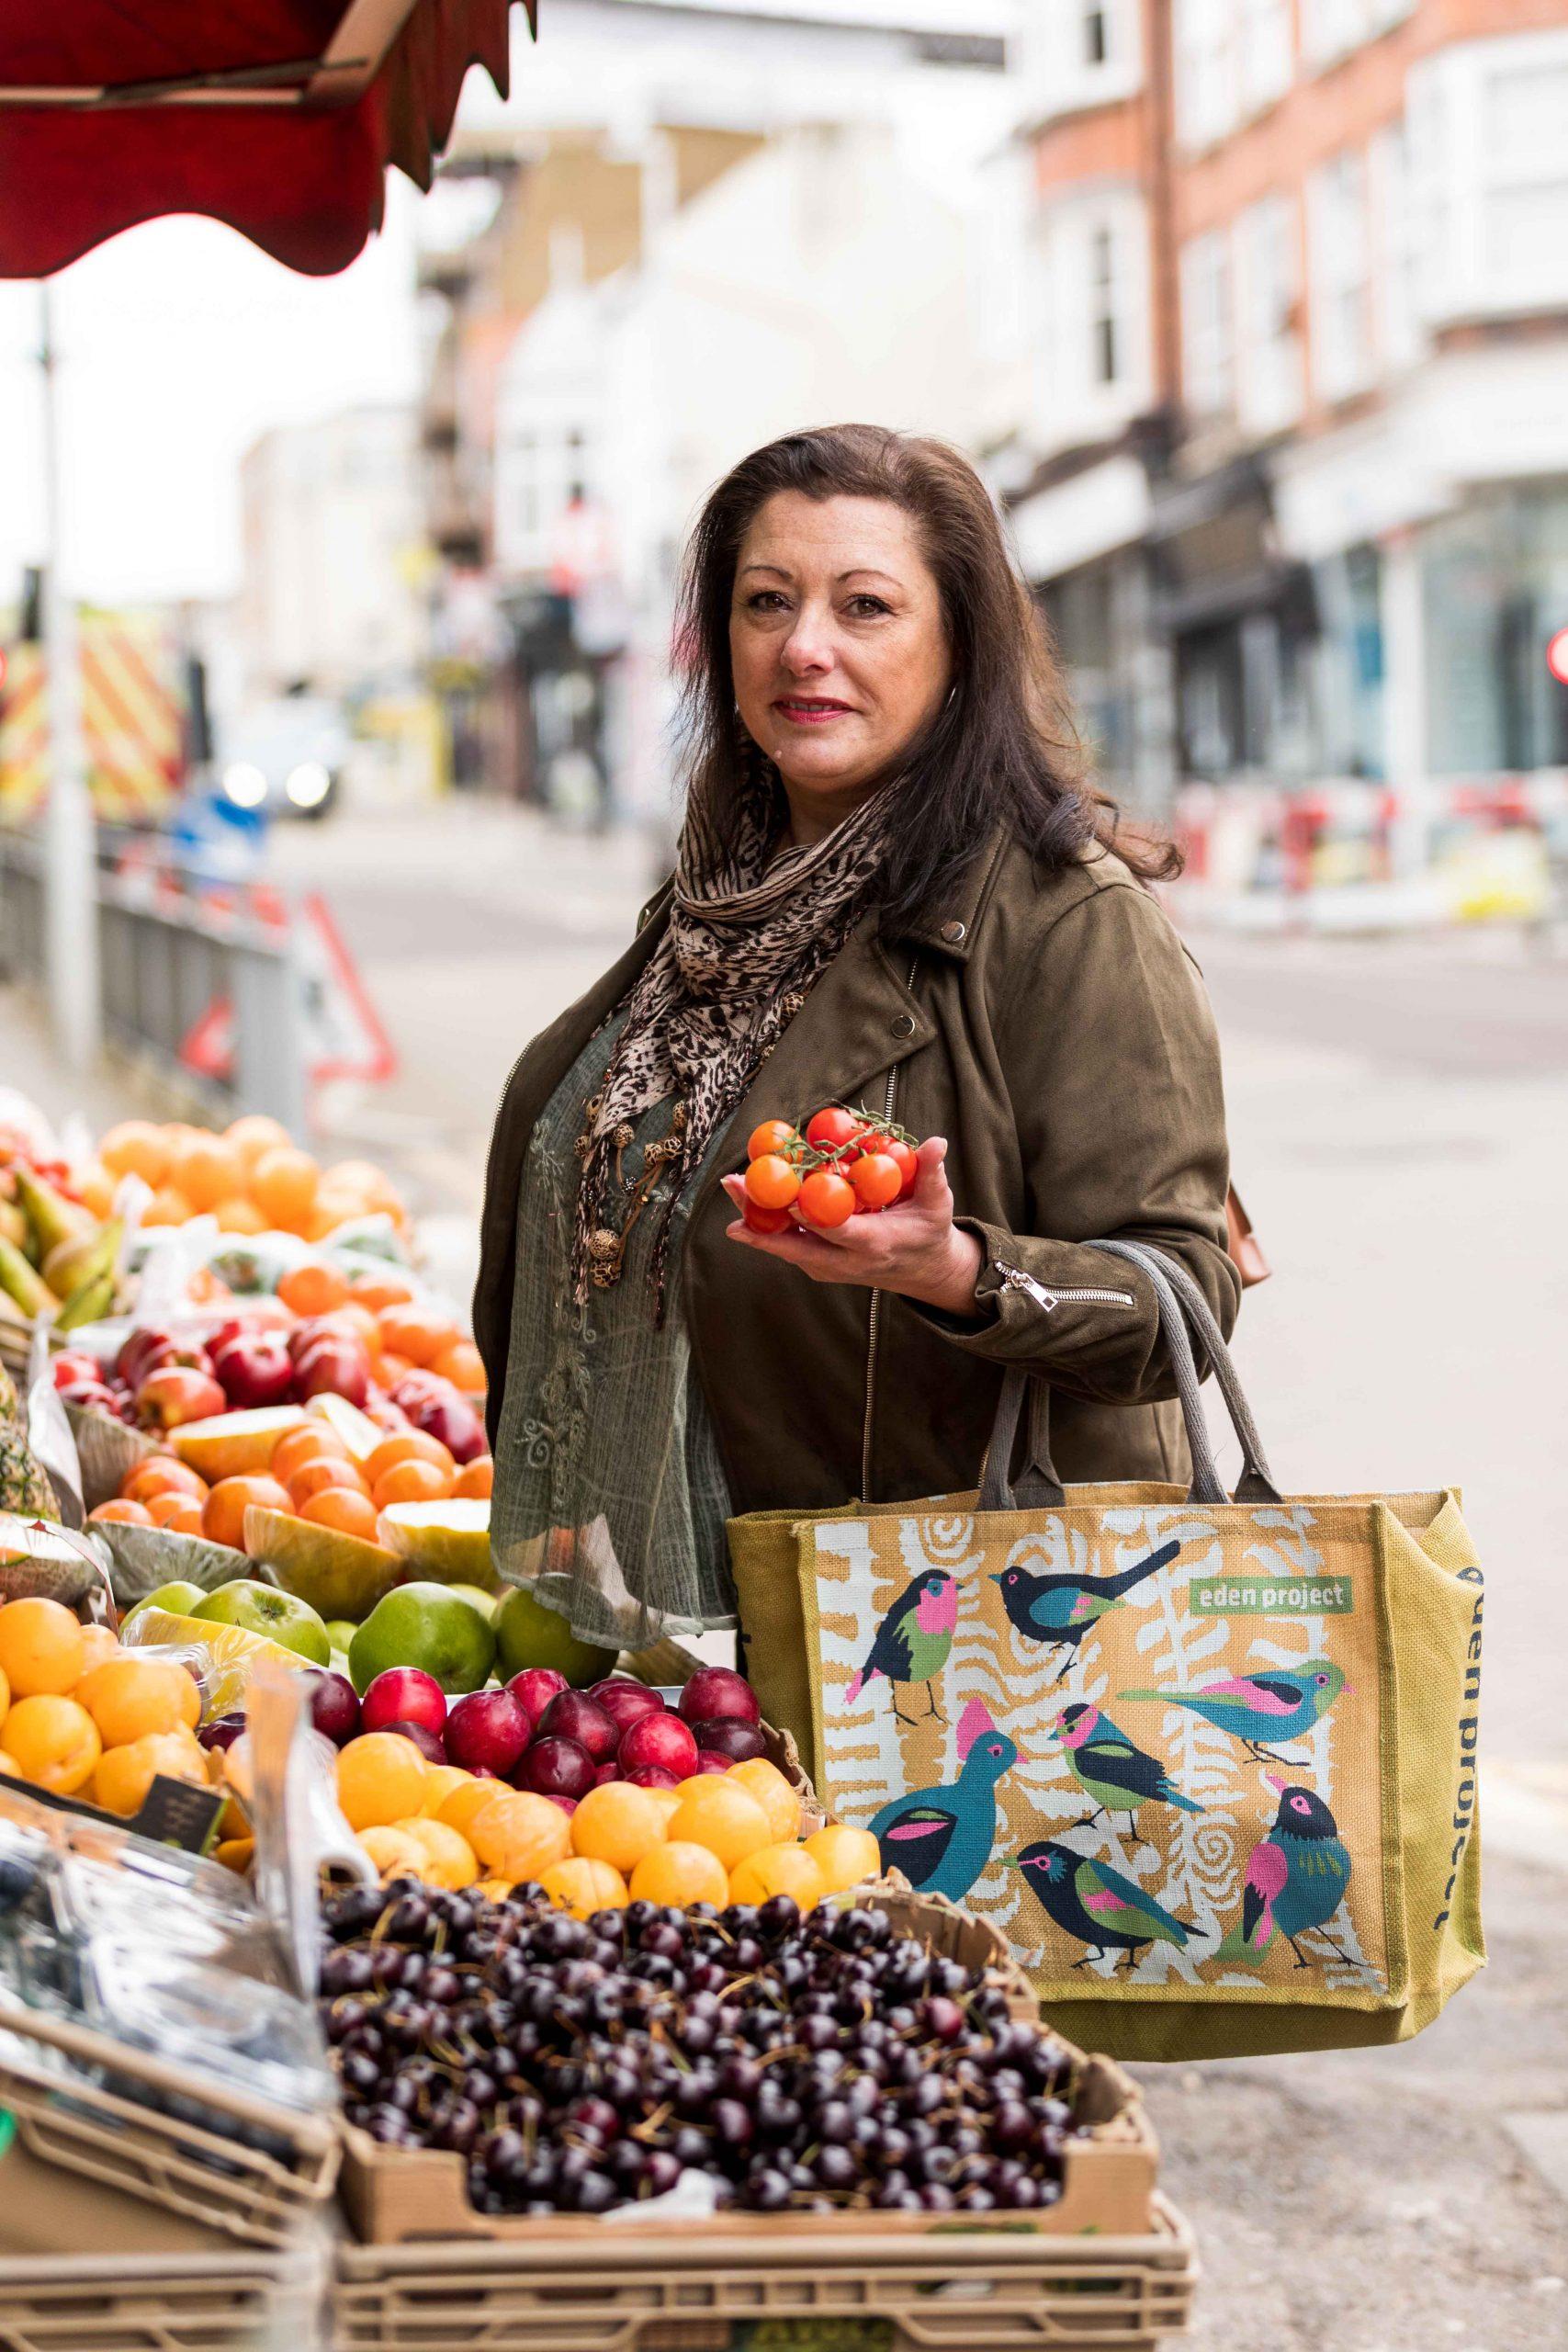 Jacqui at the Greengrocers